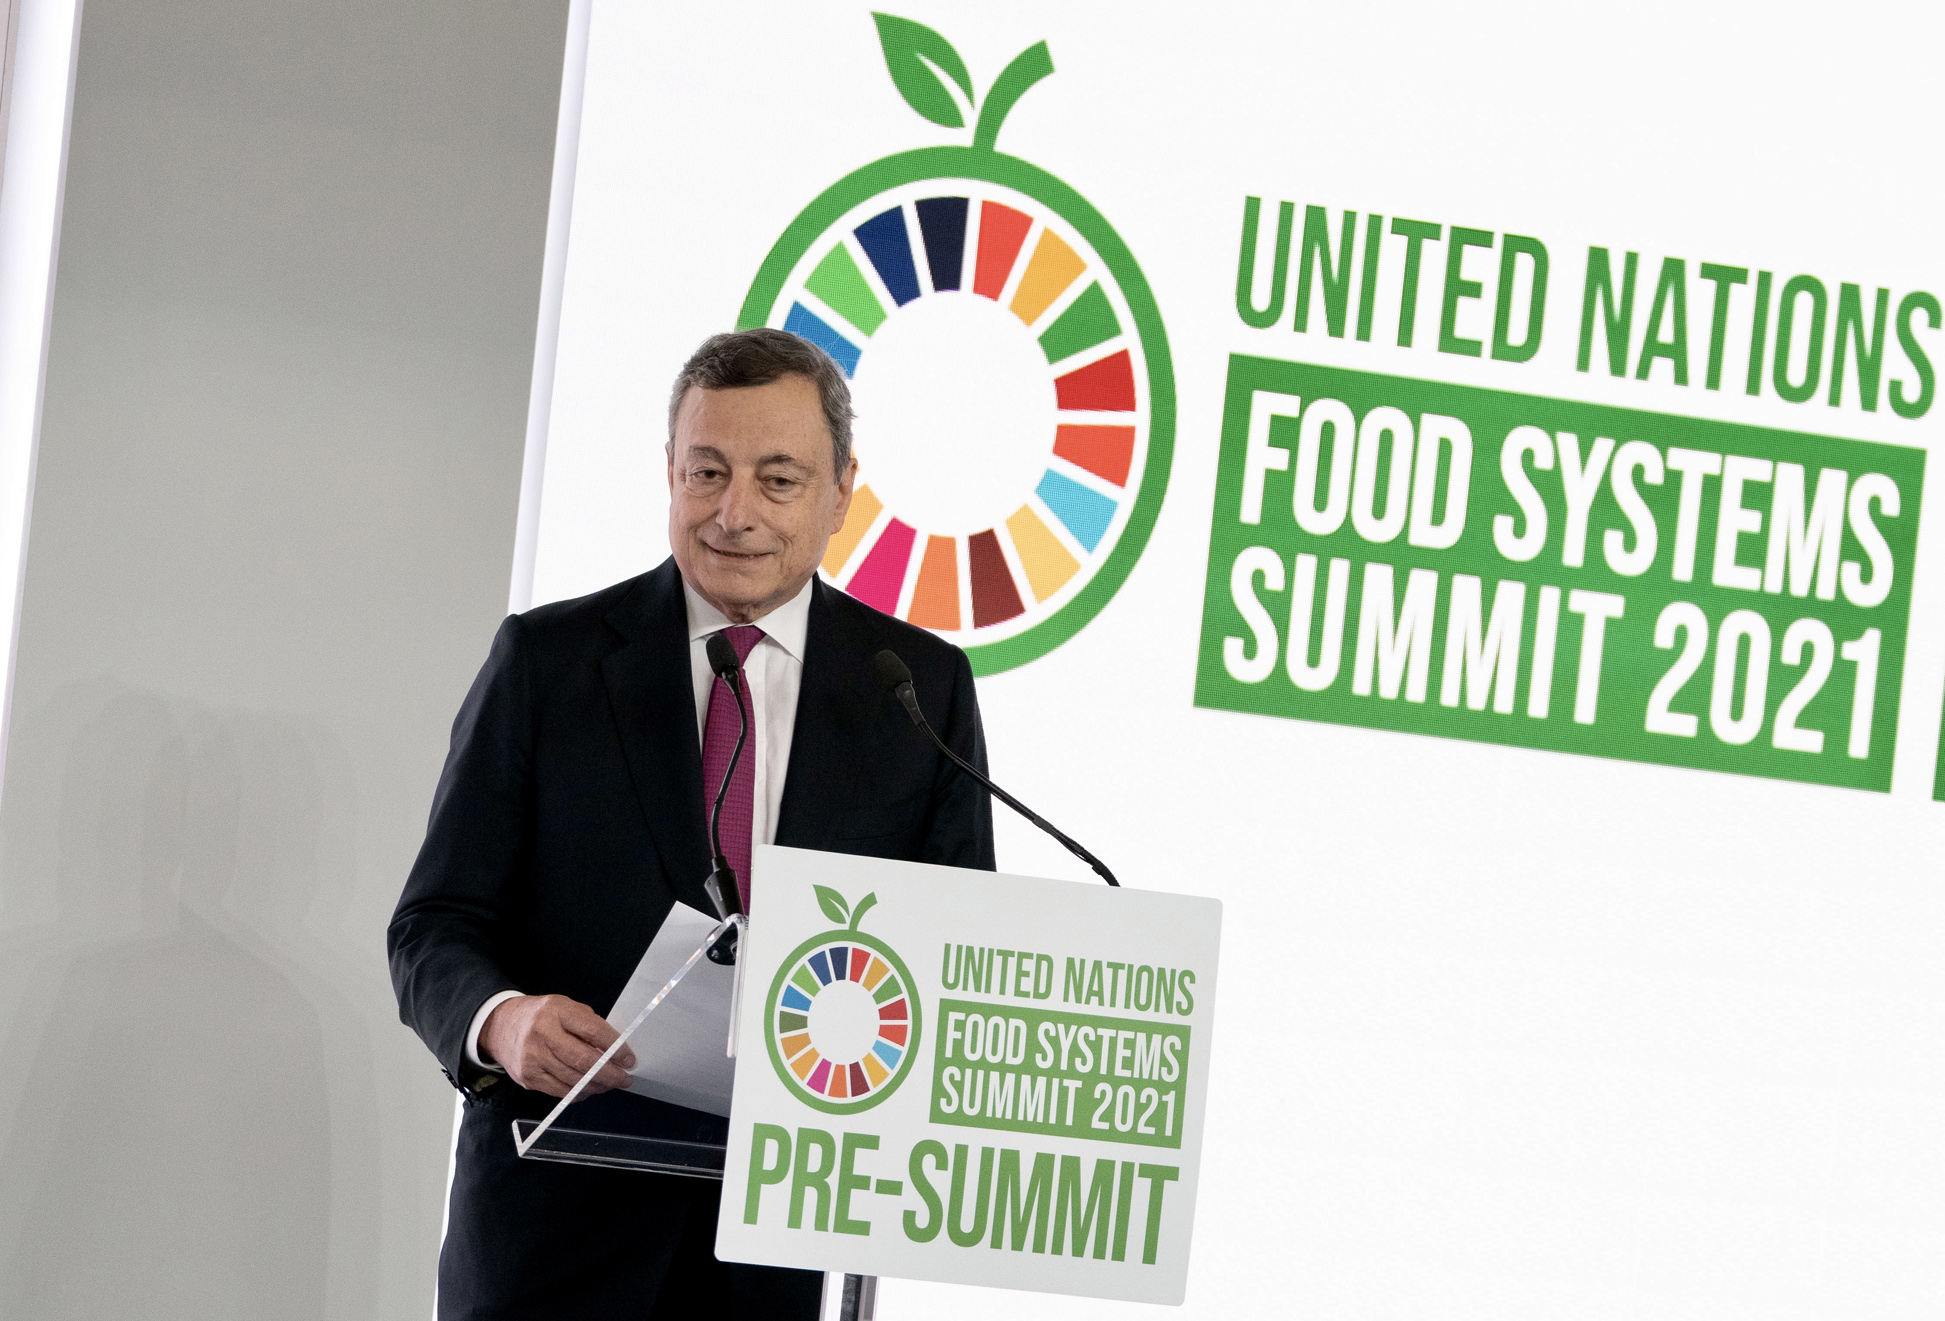 Mario Draghi al Summit sui Sistemi Alimentari